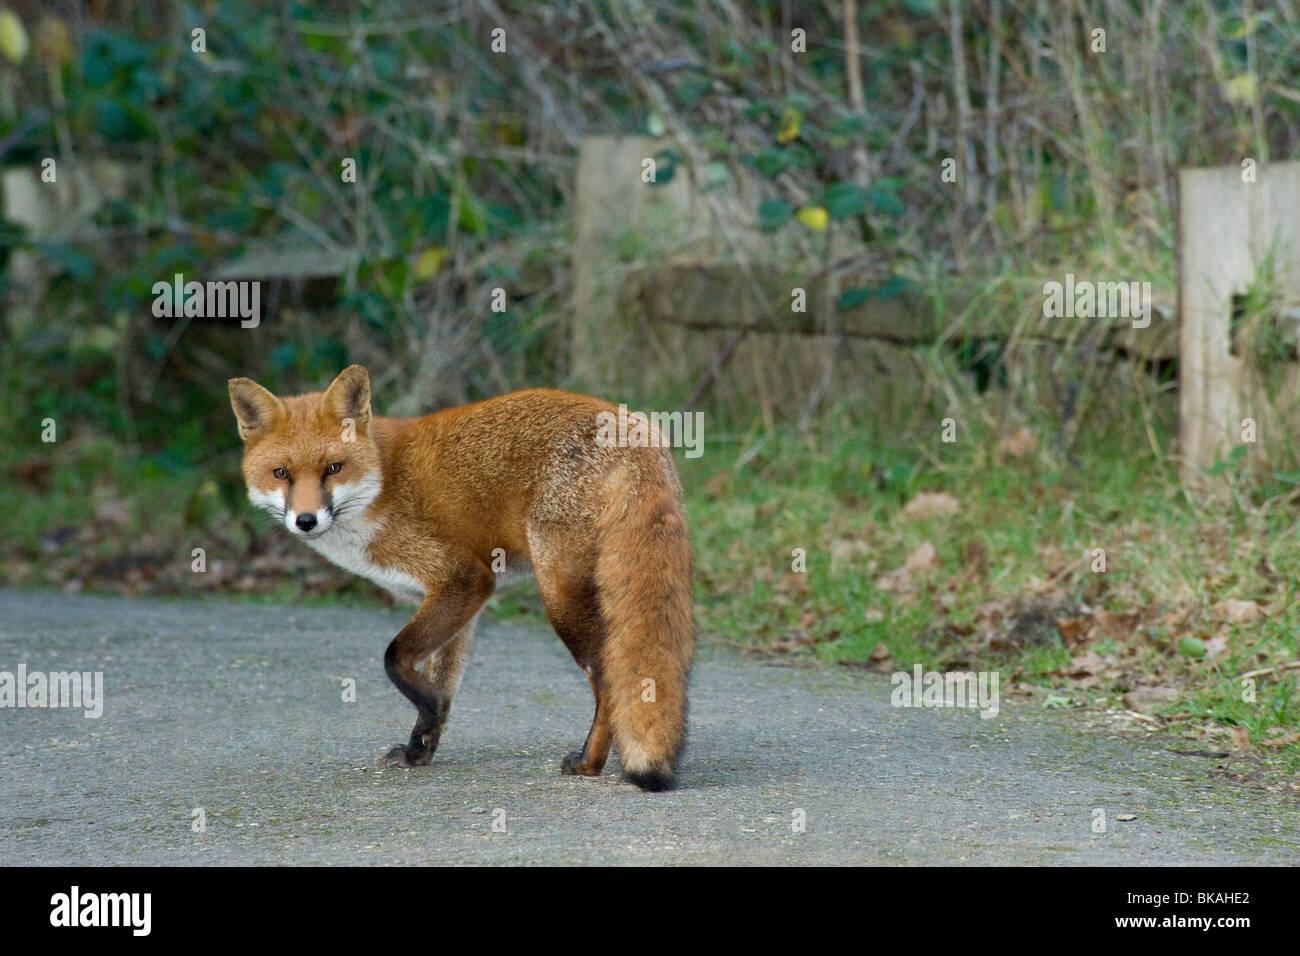 Red fox, Vulpes vulpes, pauses to look at camera as walks along path - Stock Image